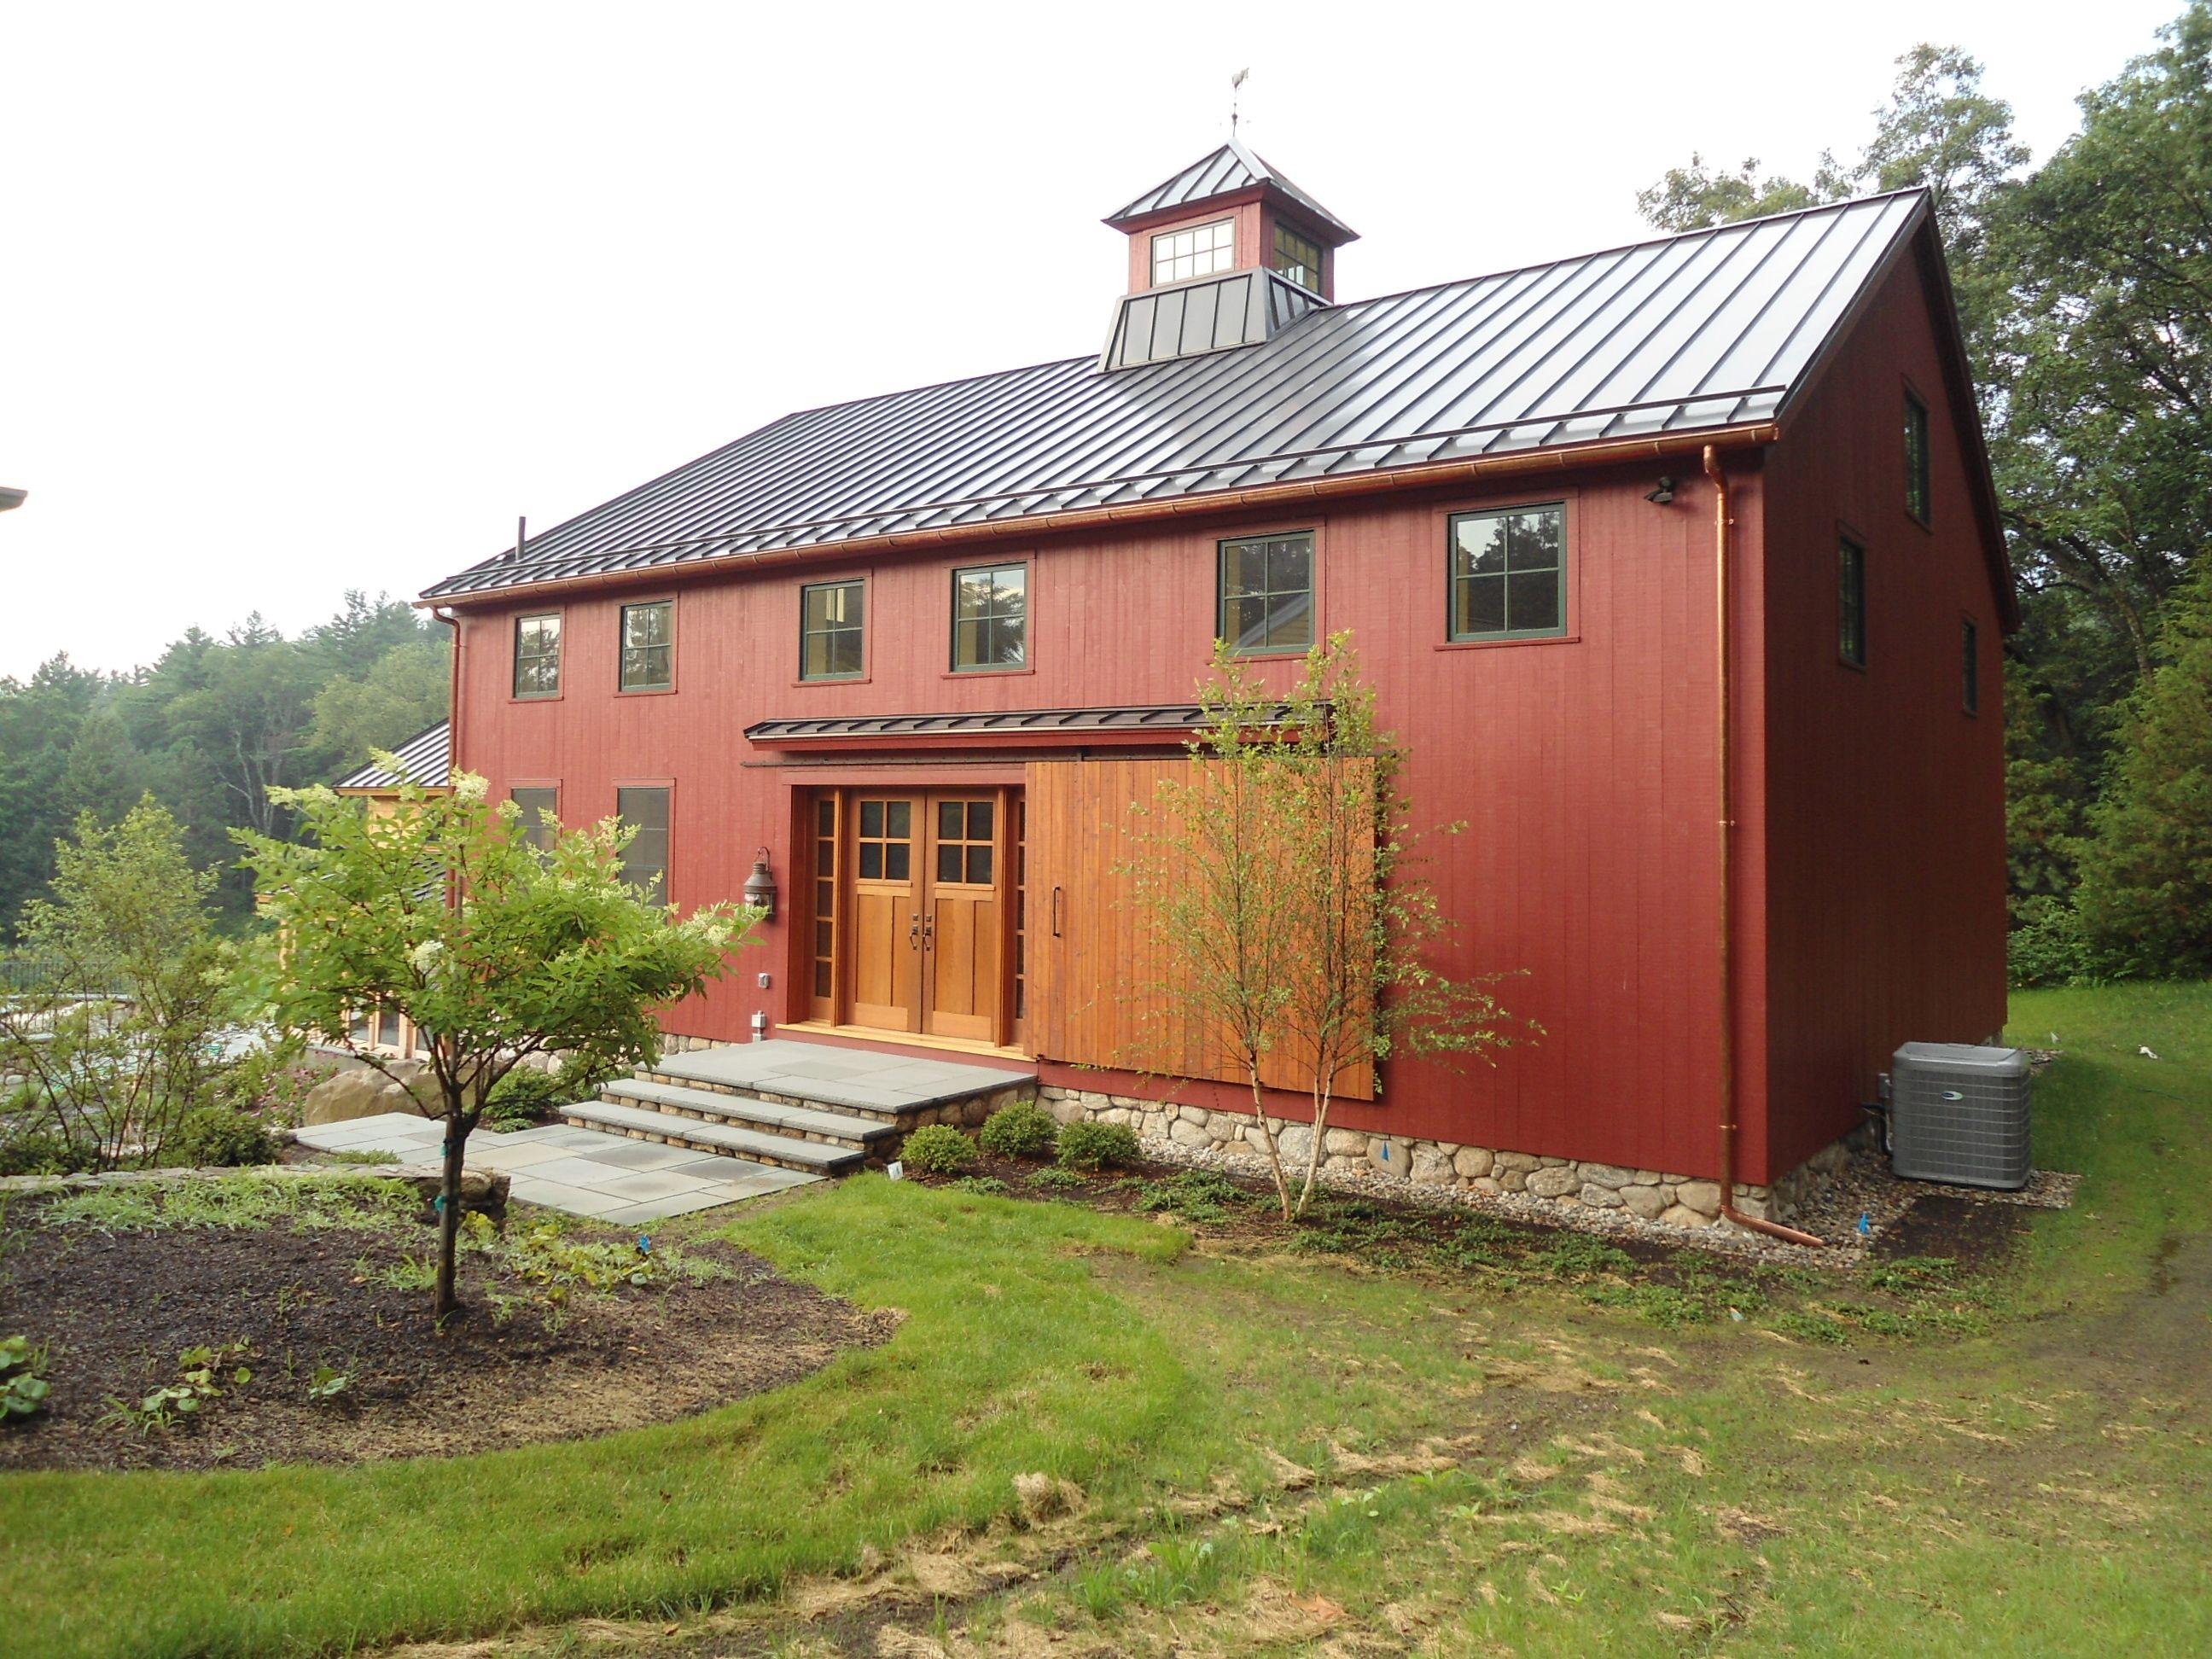 Timberframe family entertainment barn with half basketball court ...